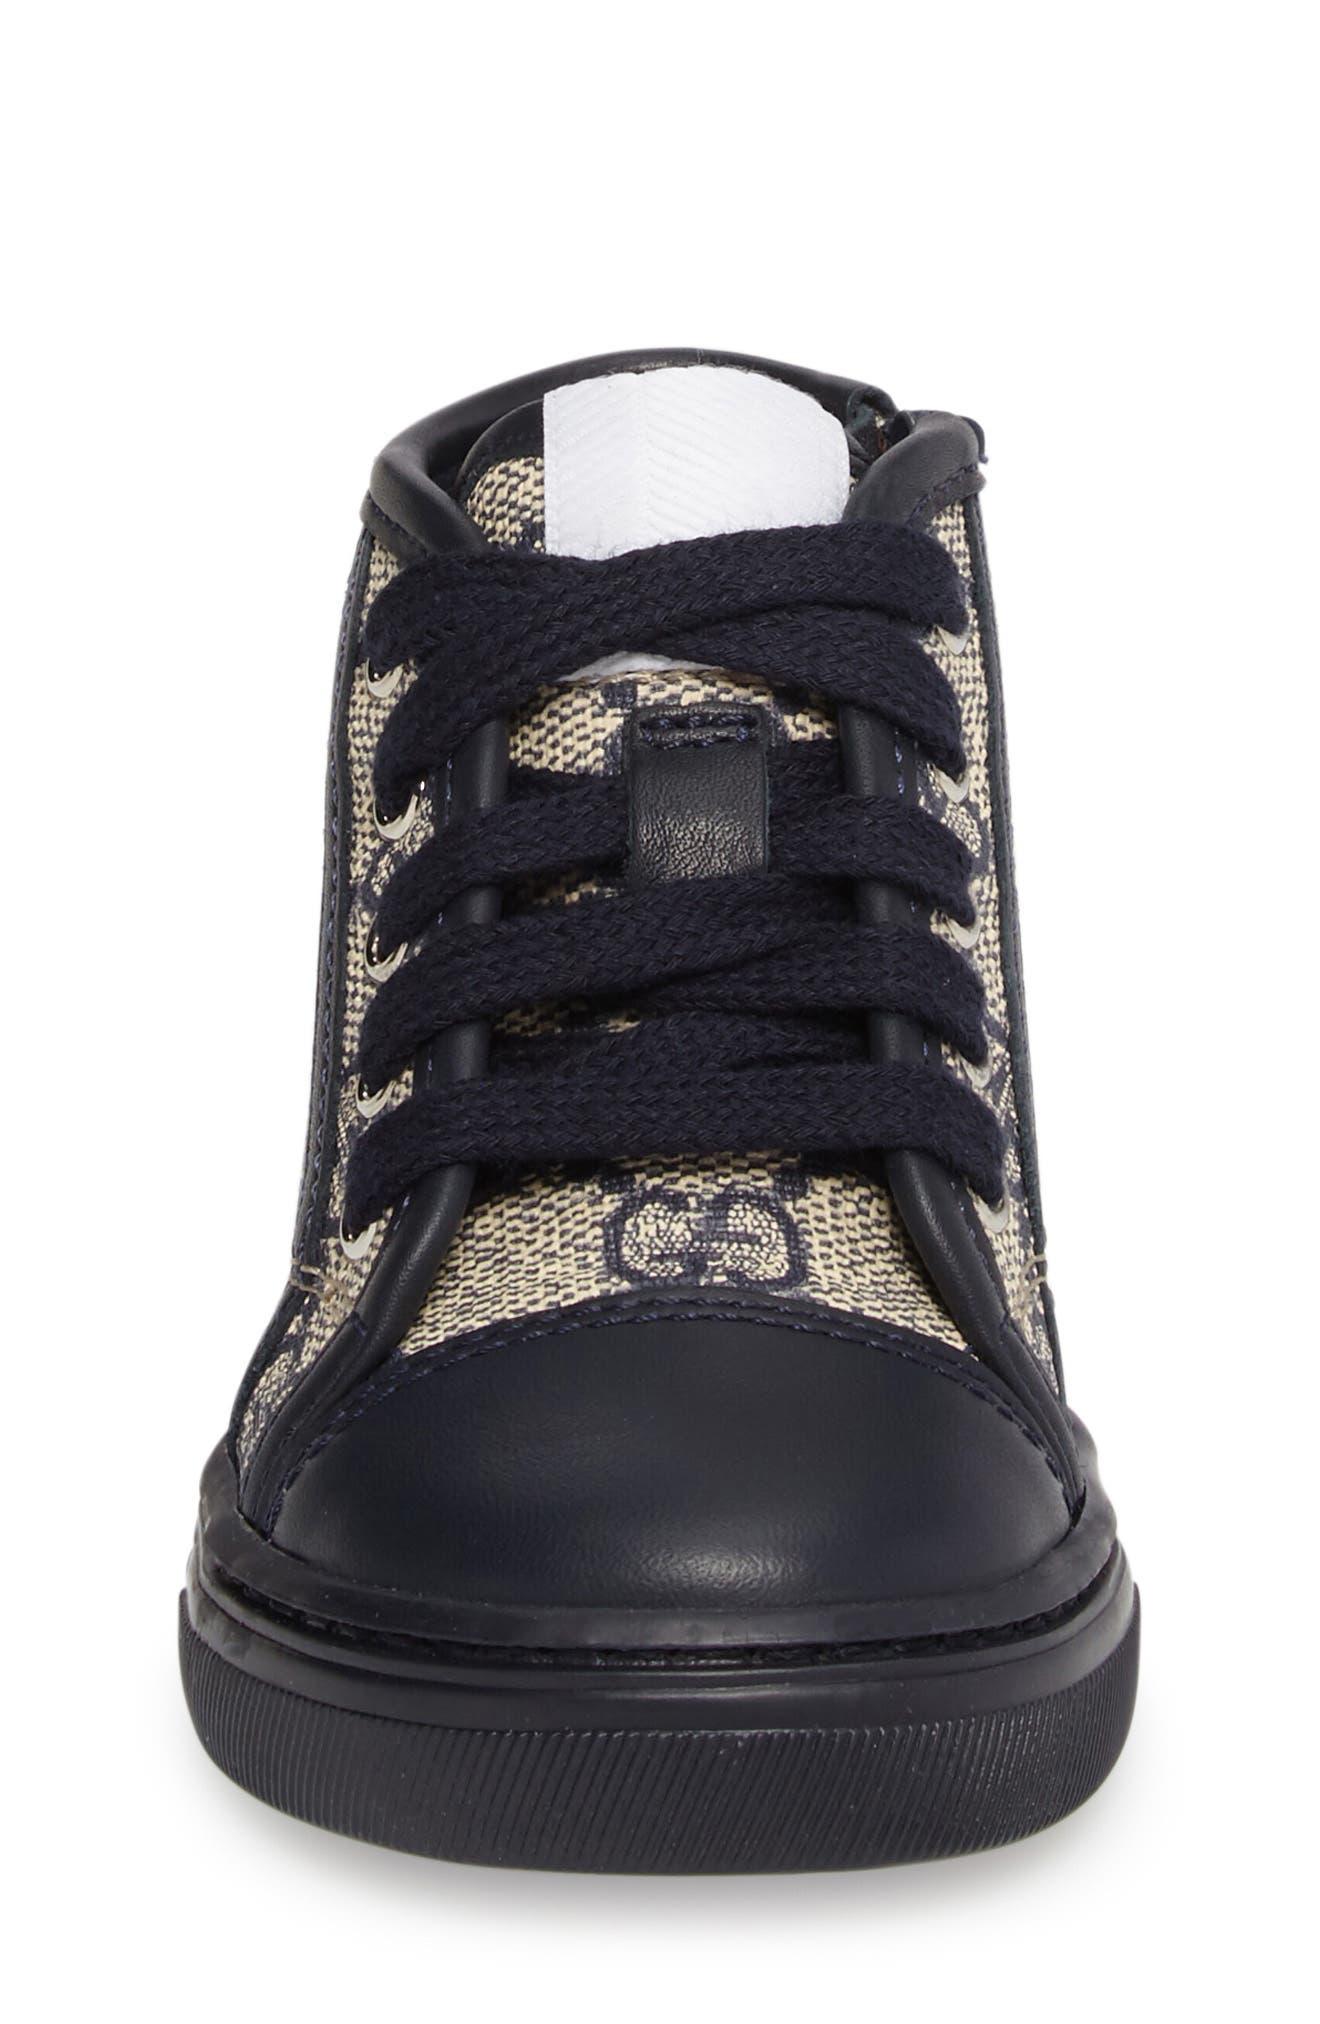 GUCCI,                             GG Supreme High Top Sneaker,                             Alternate thumbnail 4, color,                             417